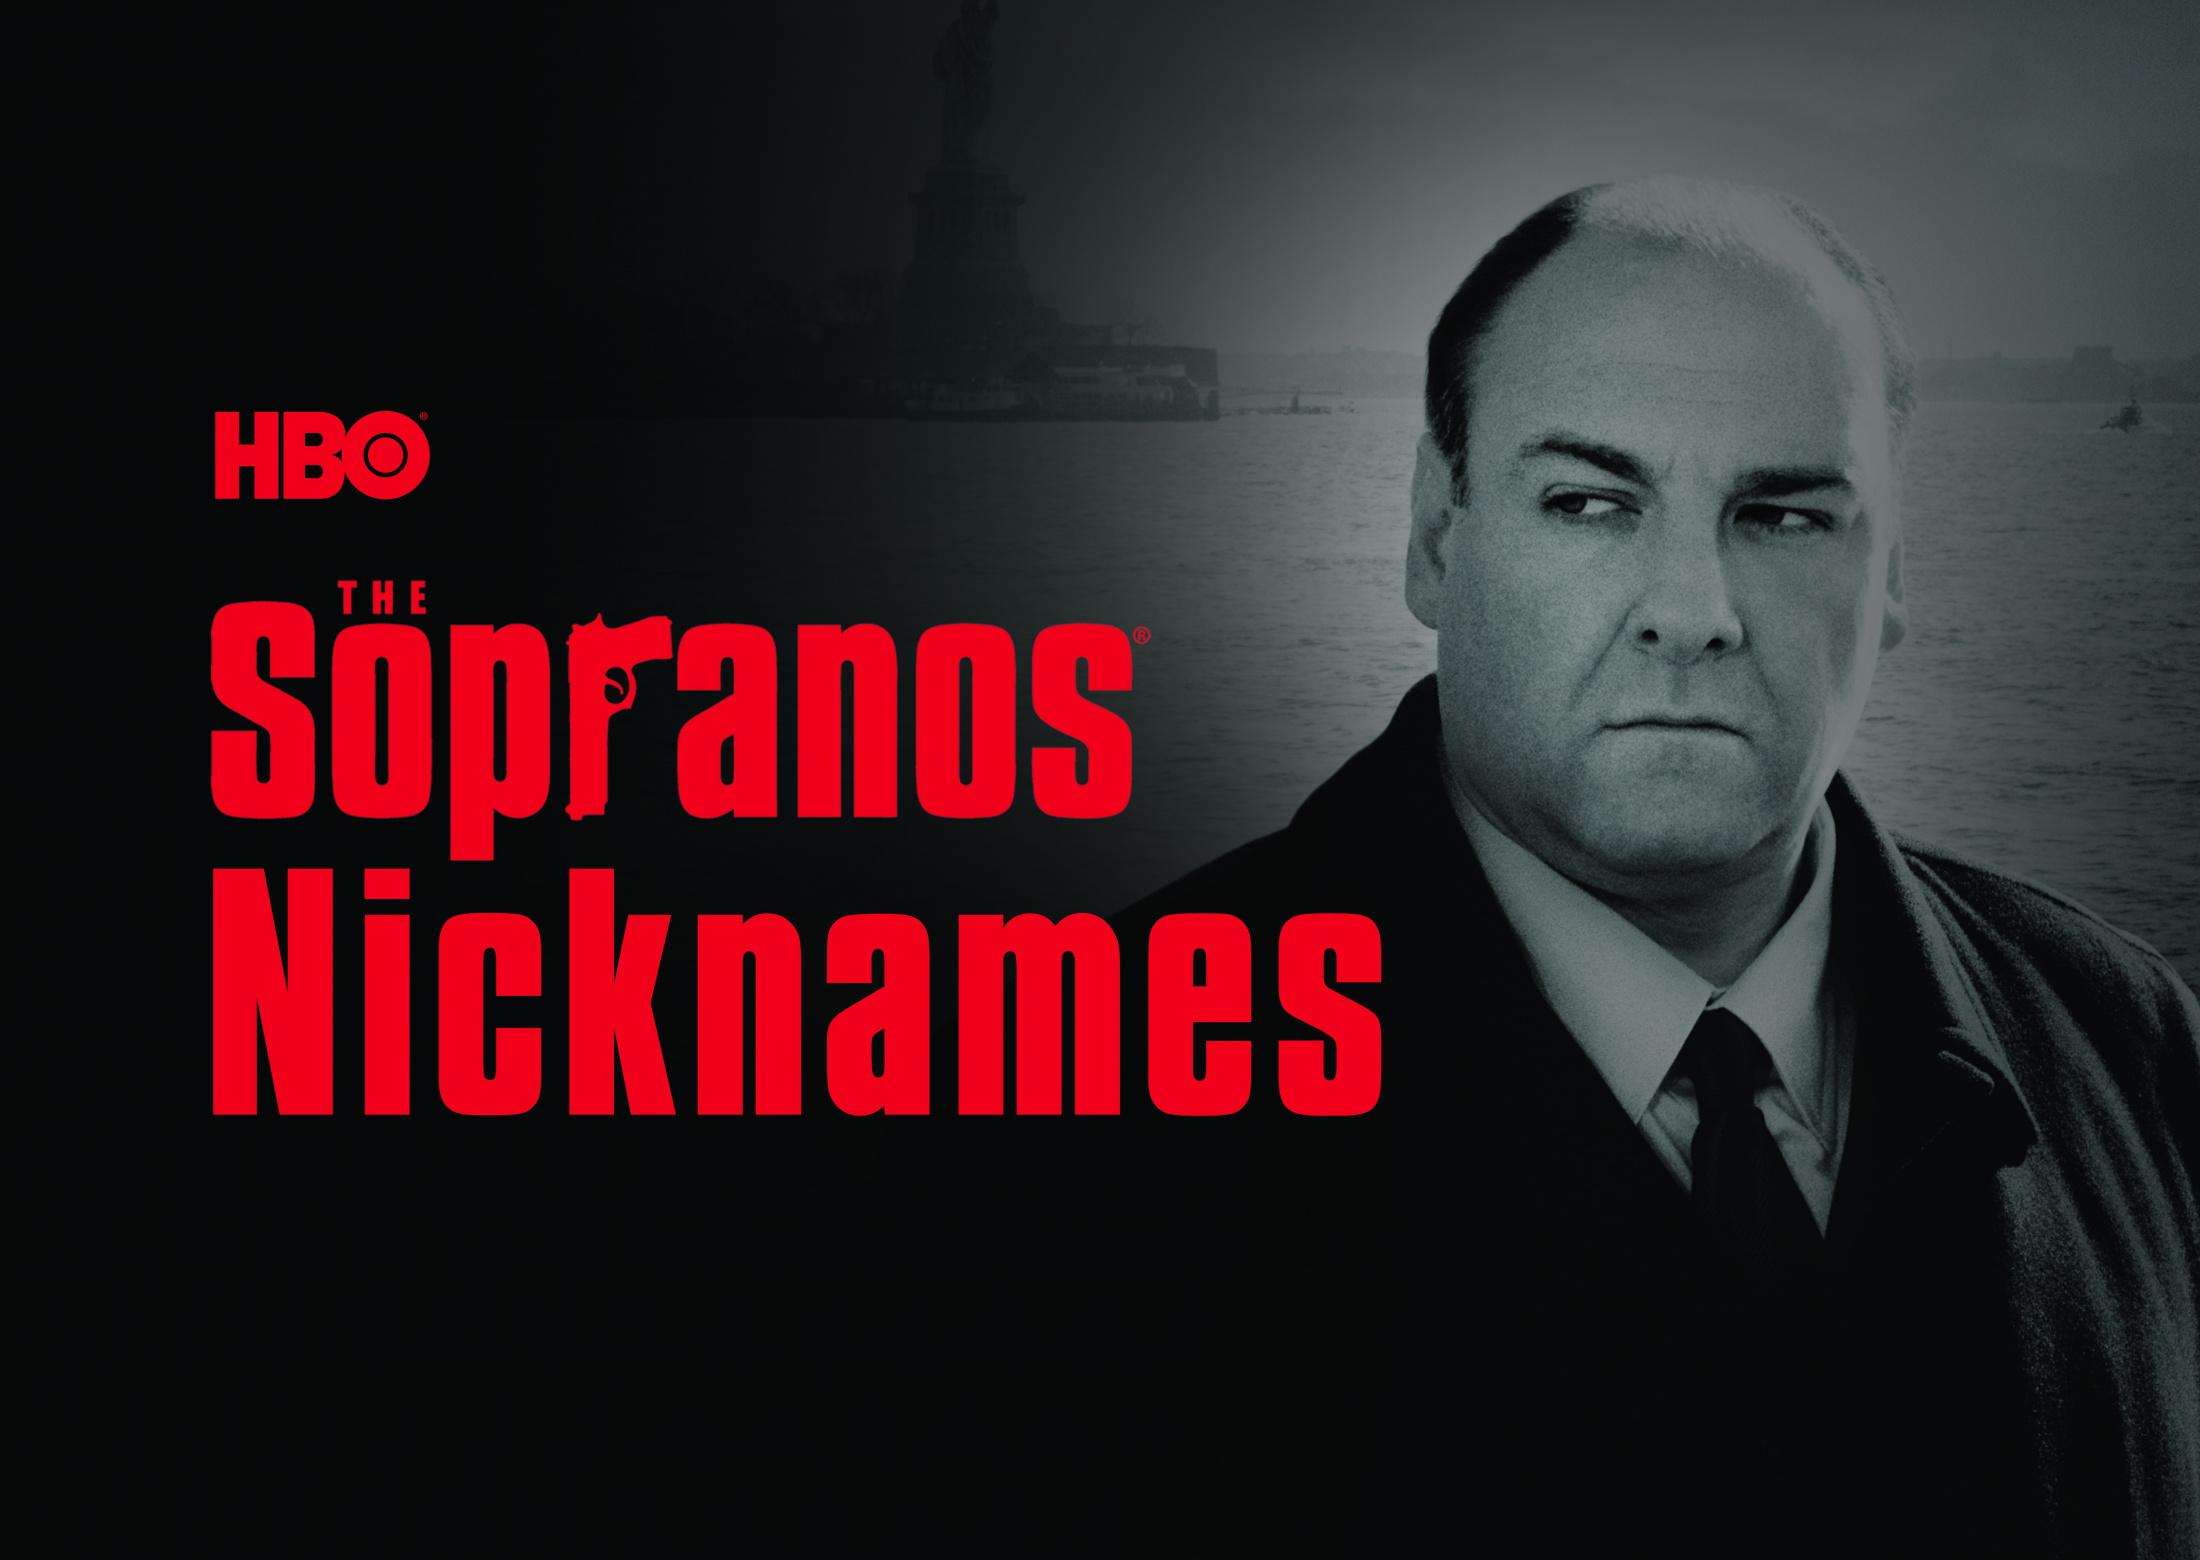 Thumbnail for Sopranos Nicknames